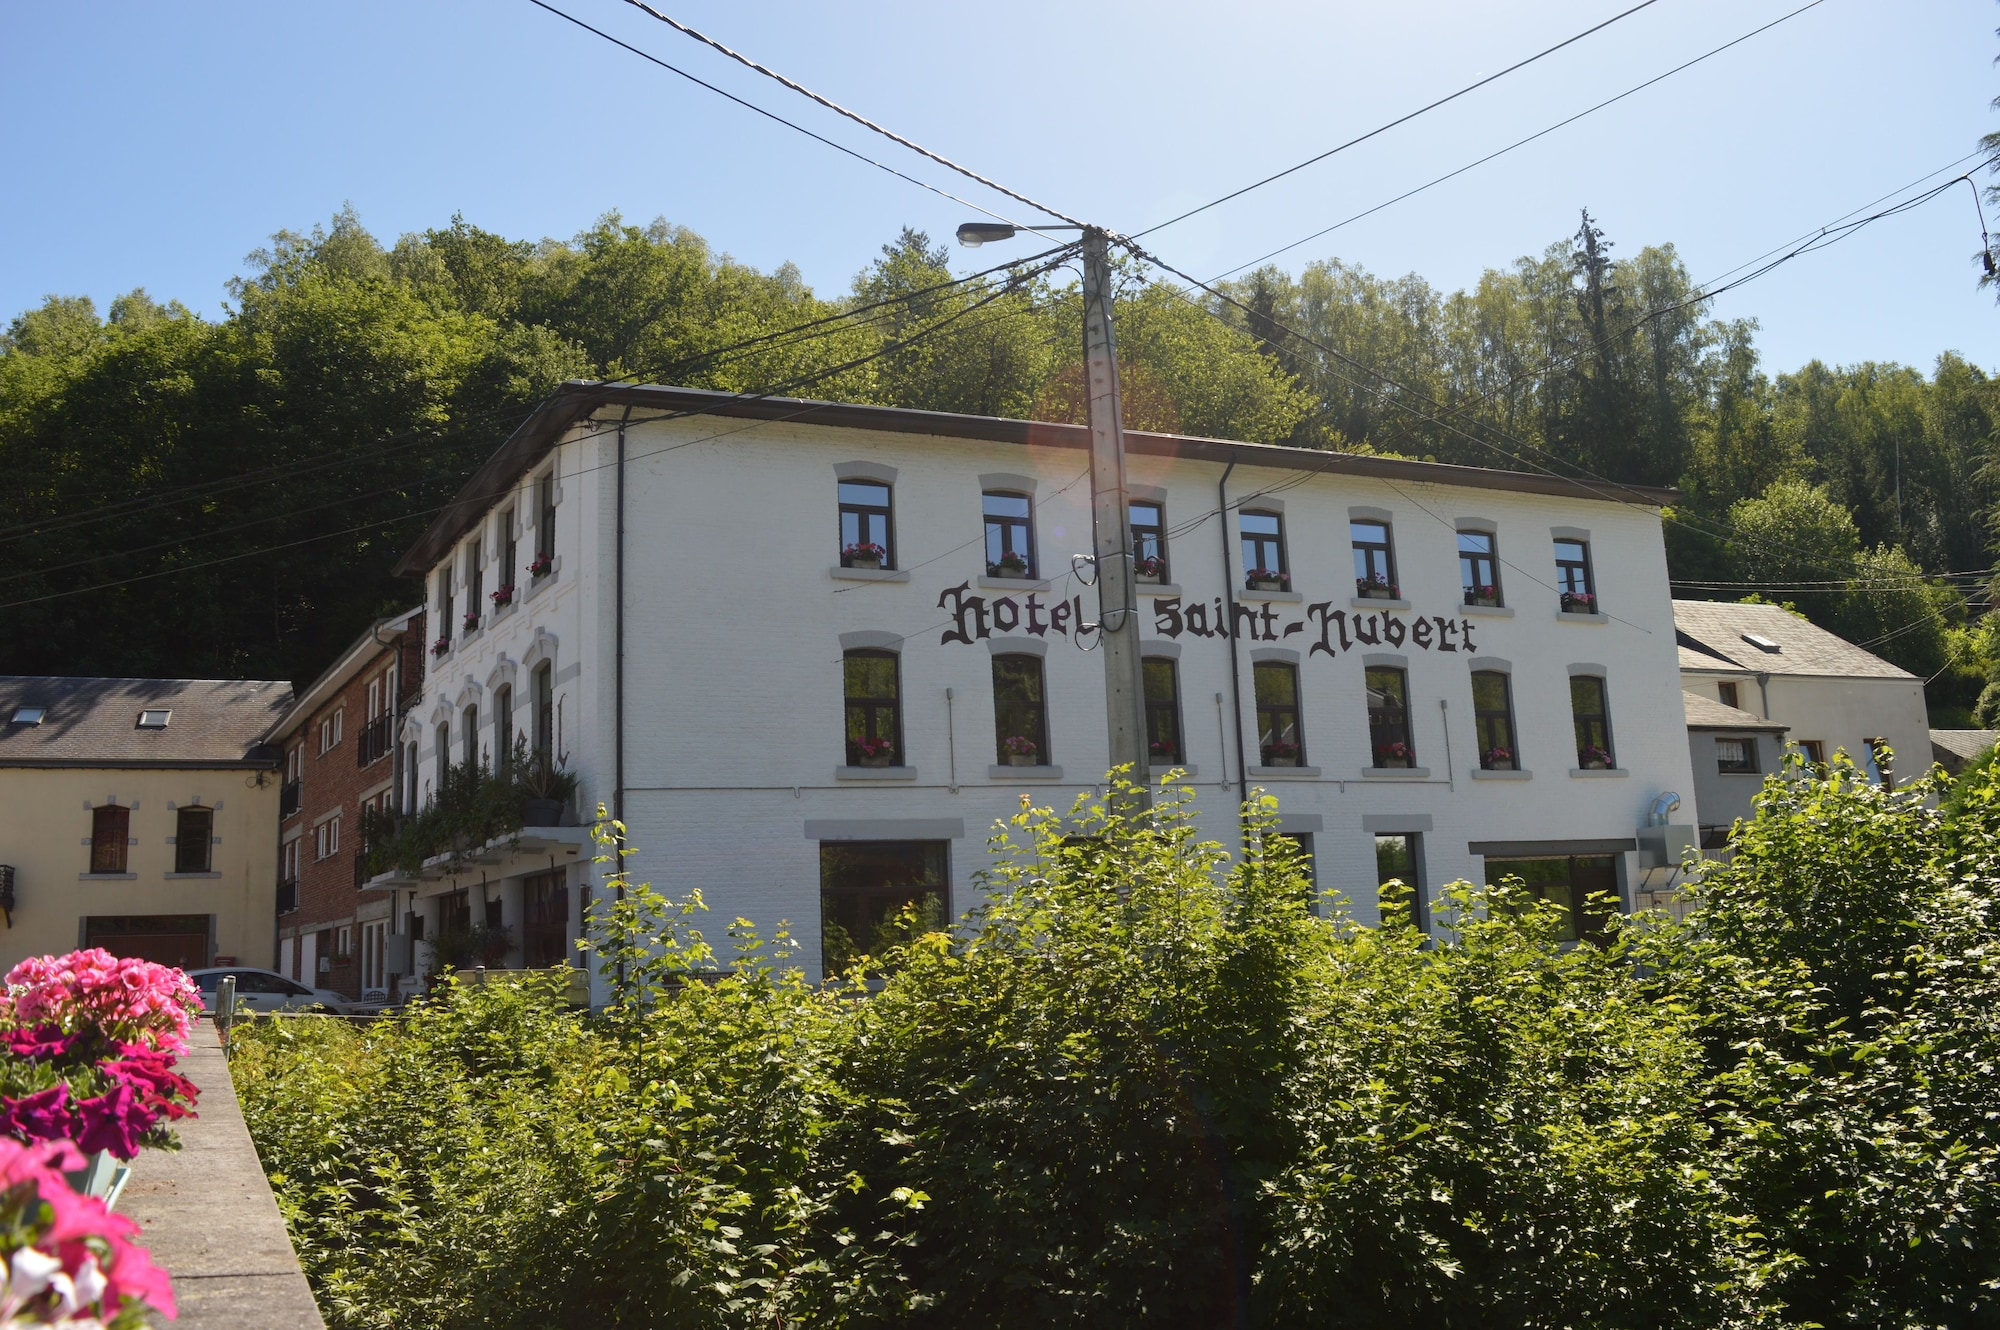 Hotel Le Saint-Hubert, Luxembourg